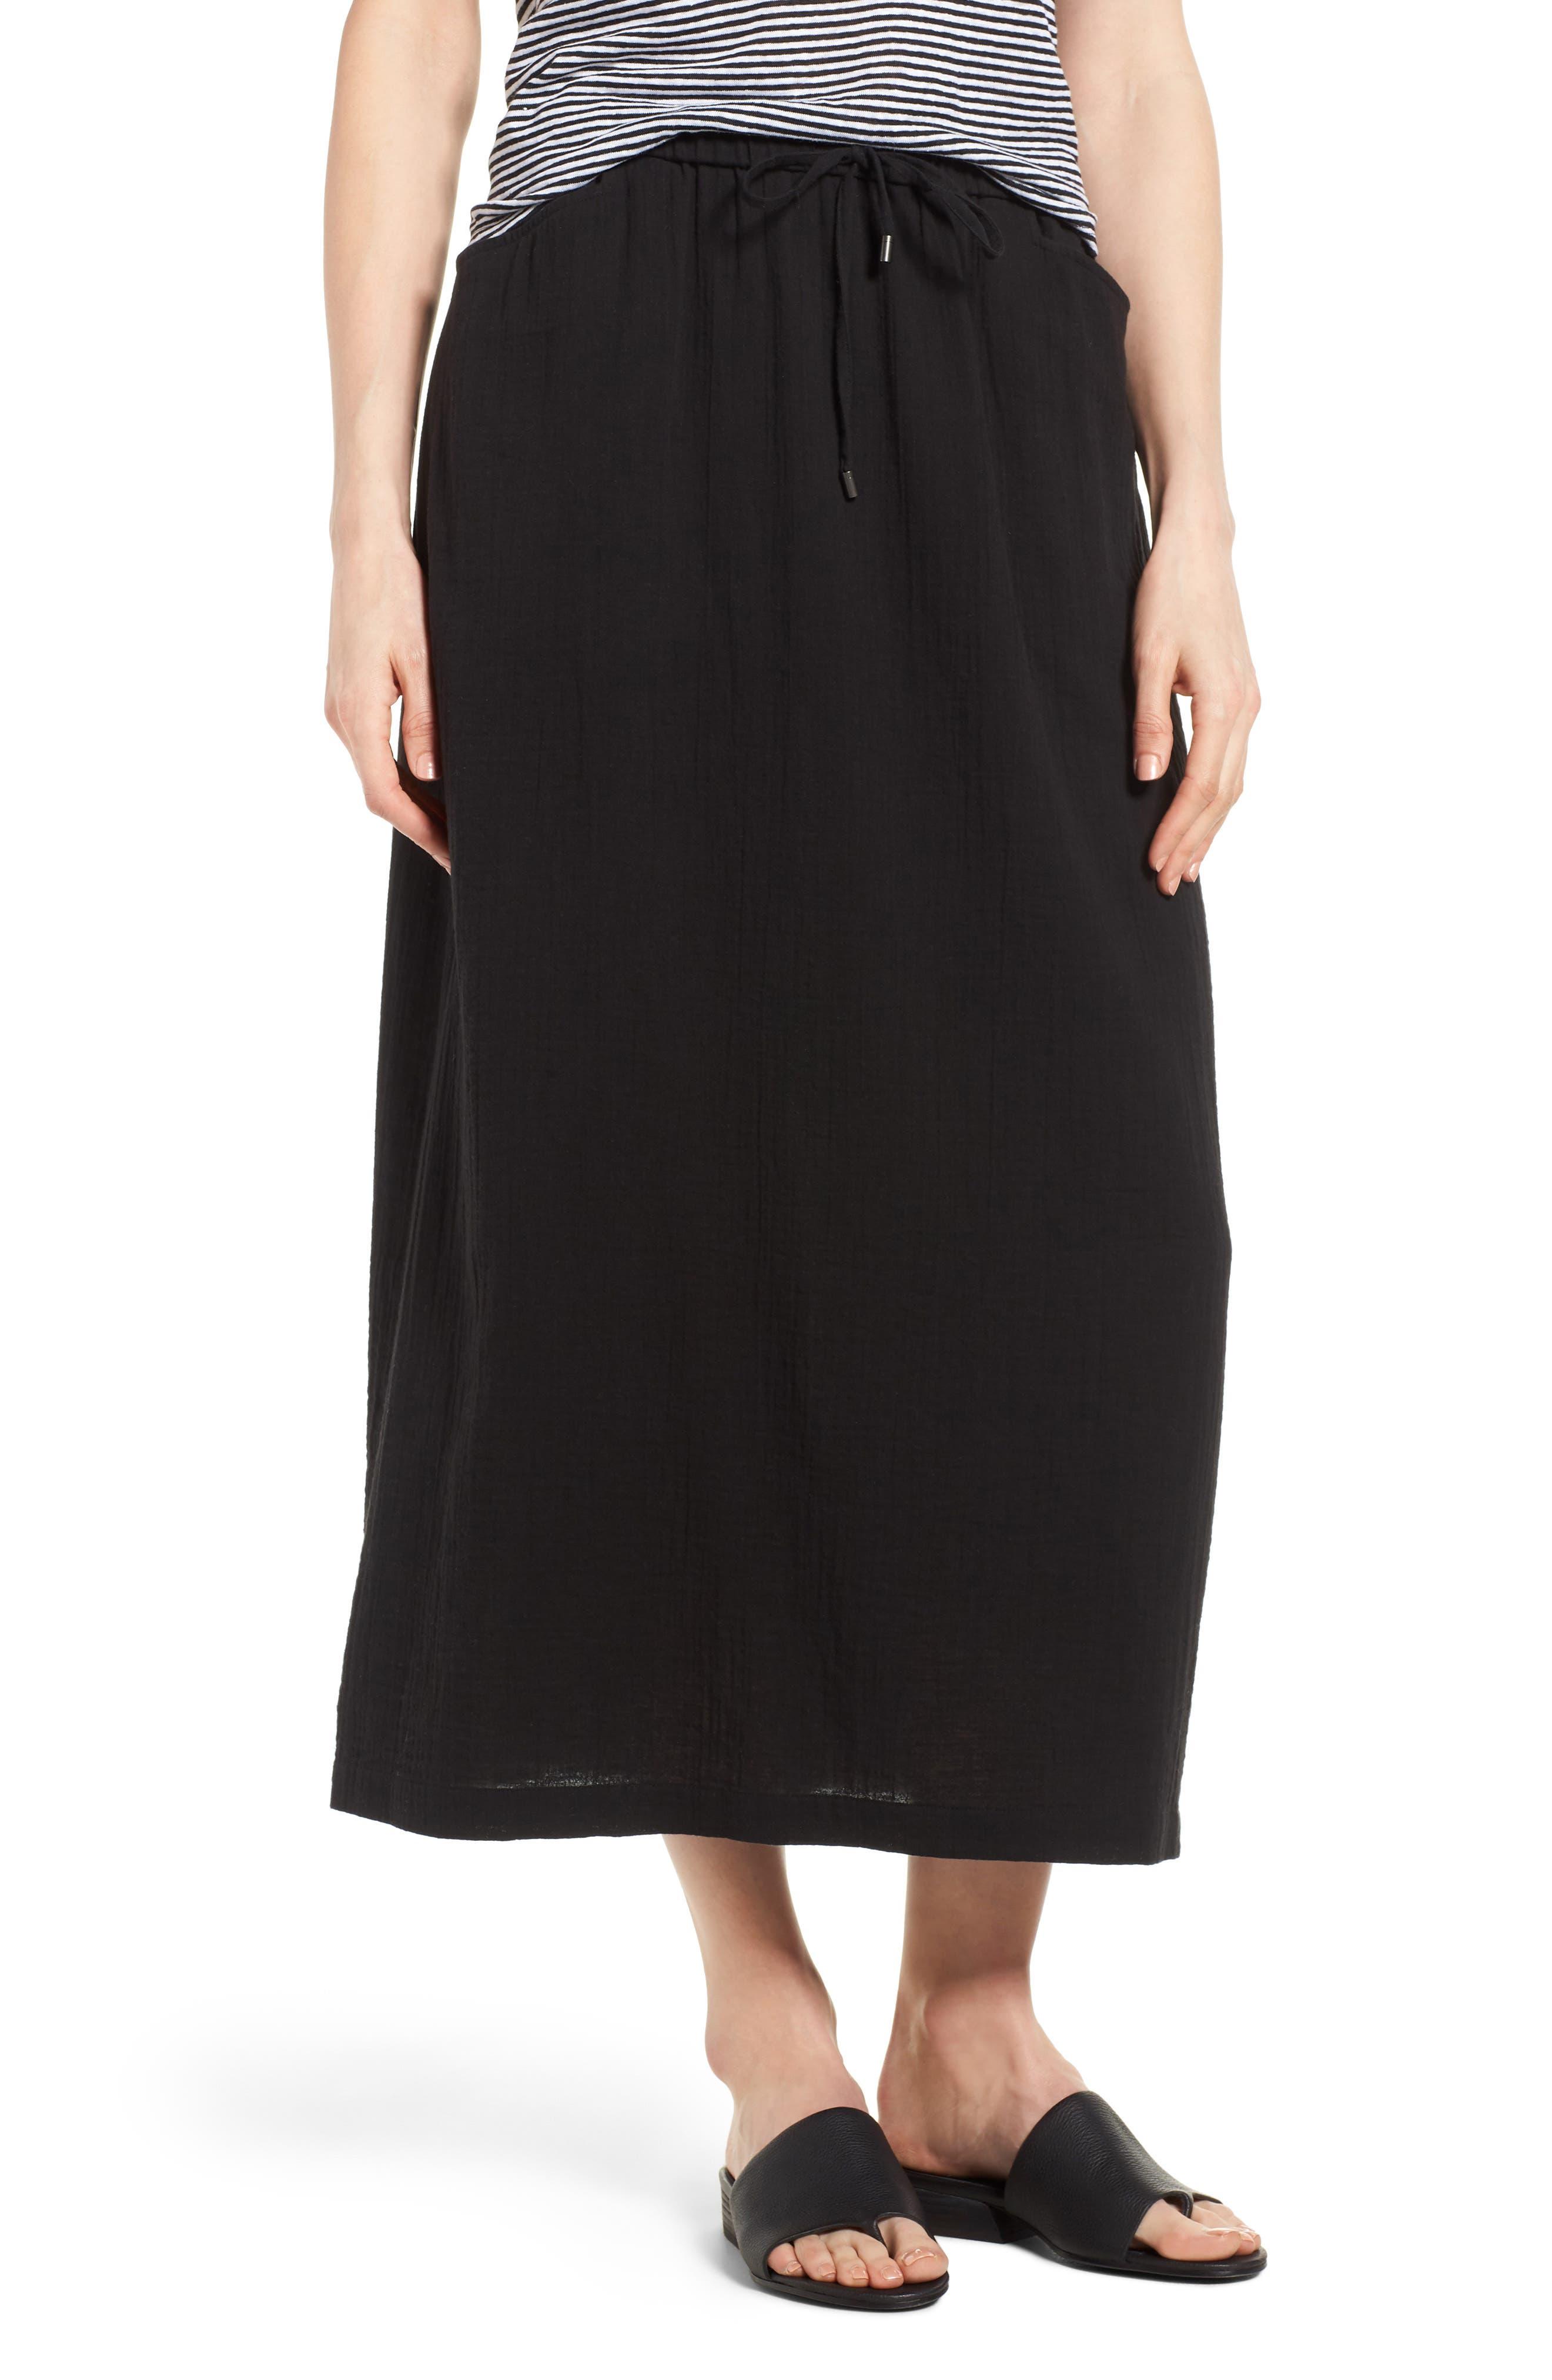 EILEEN FISHER Drawstring Organic Cotton Midi Skirt, Main, color, 001